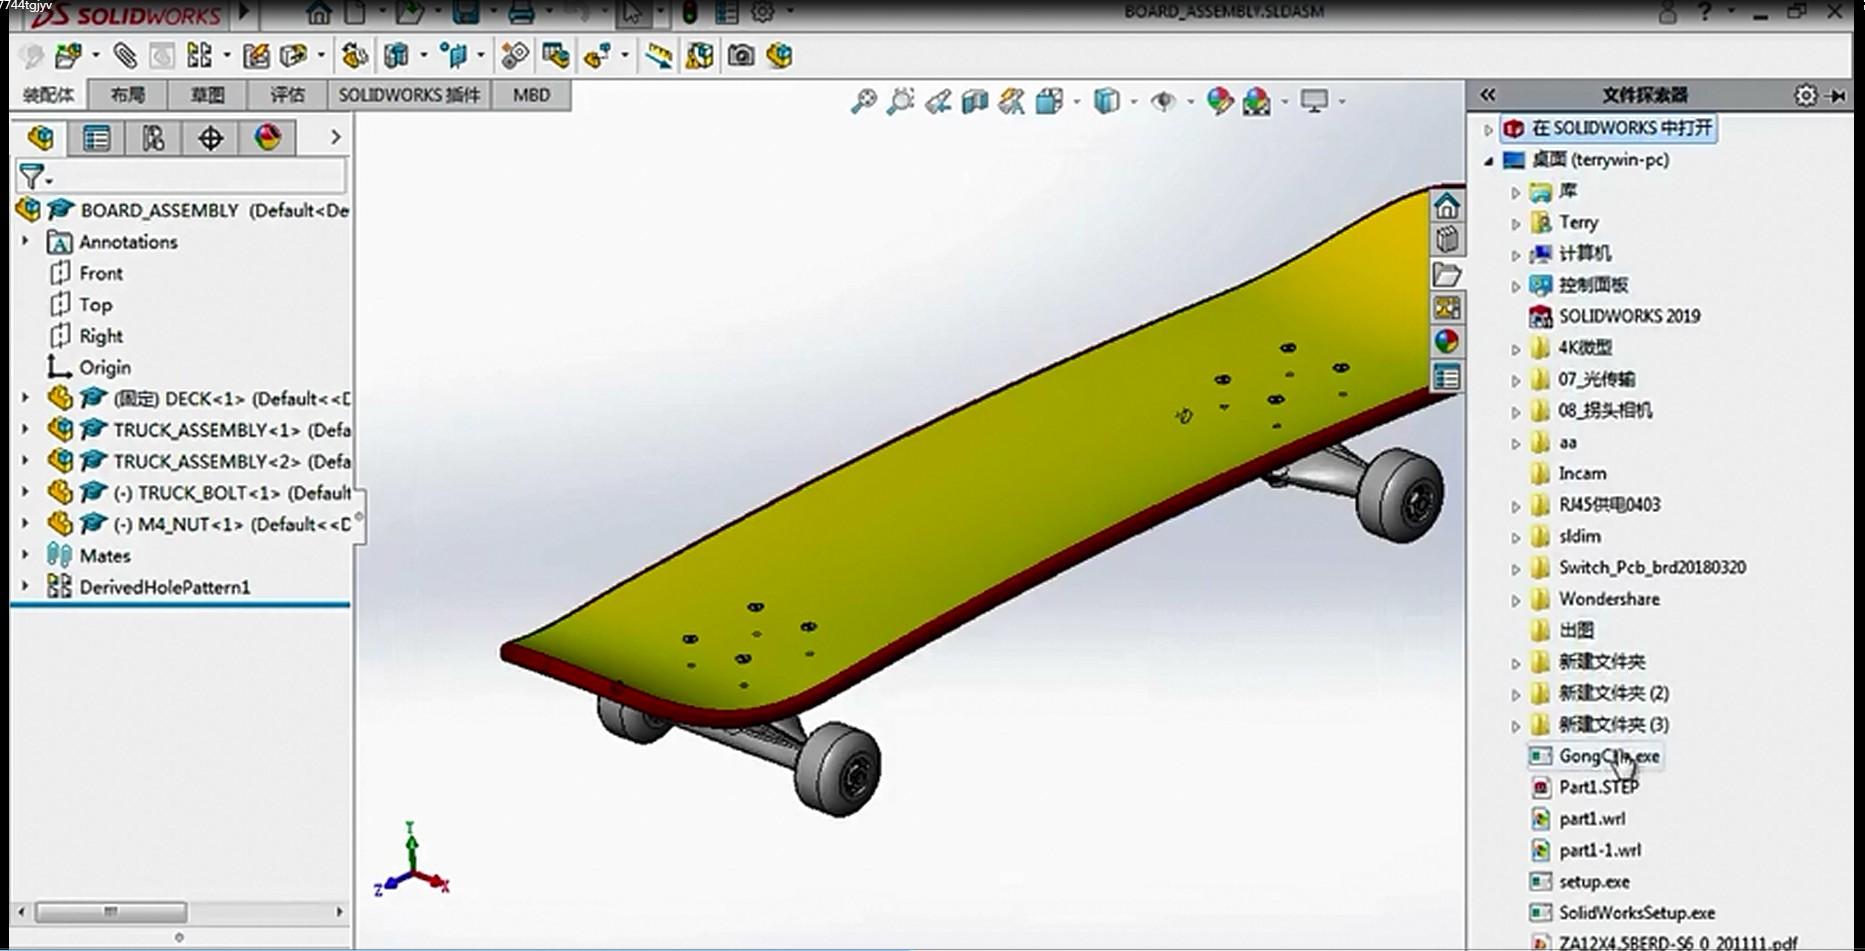 【SolidWorks操作视频】SolidWorks也可以让你尽享丝般顺滑